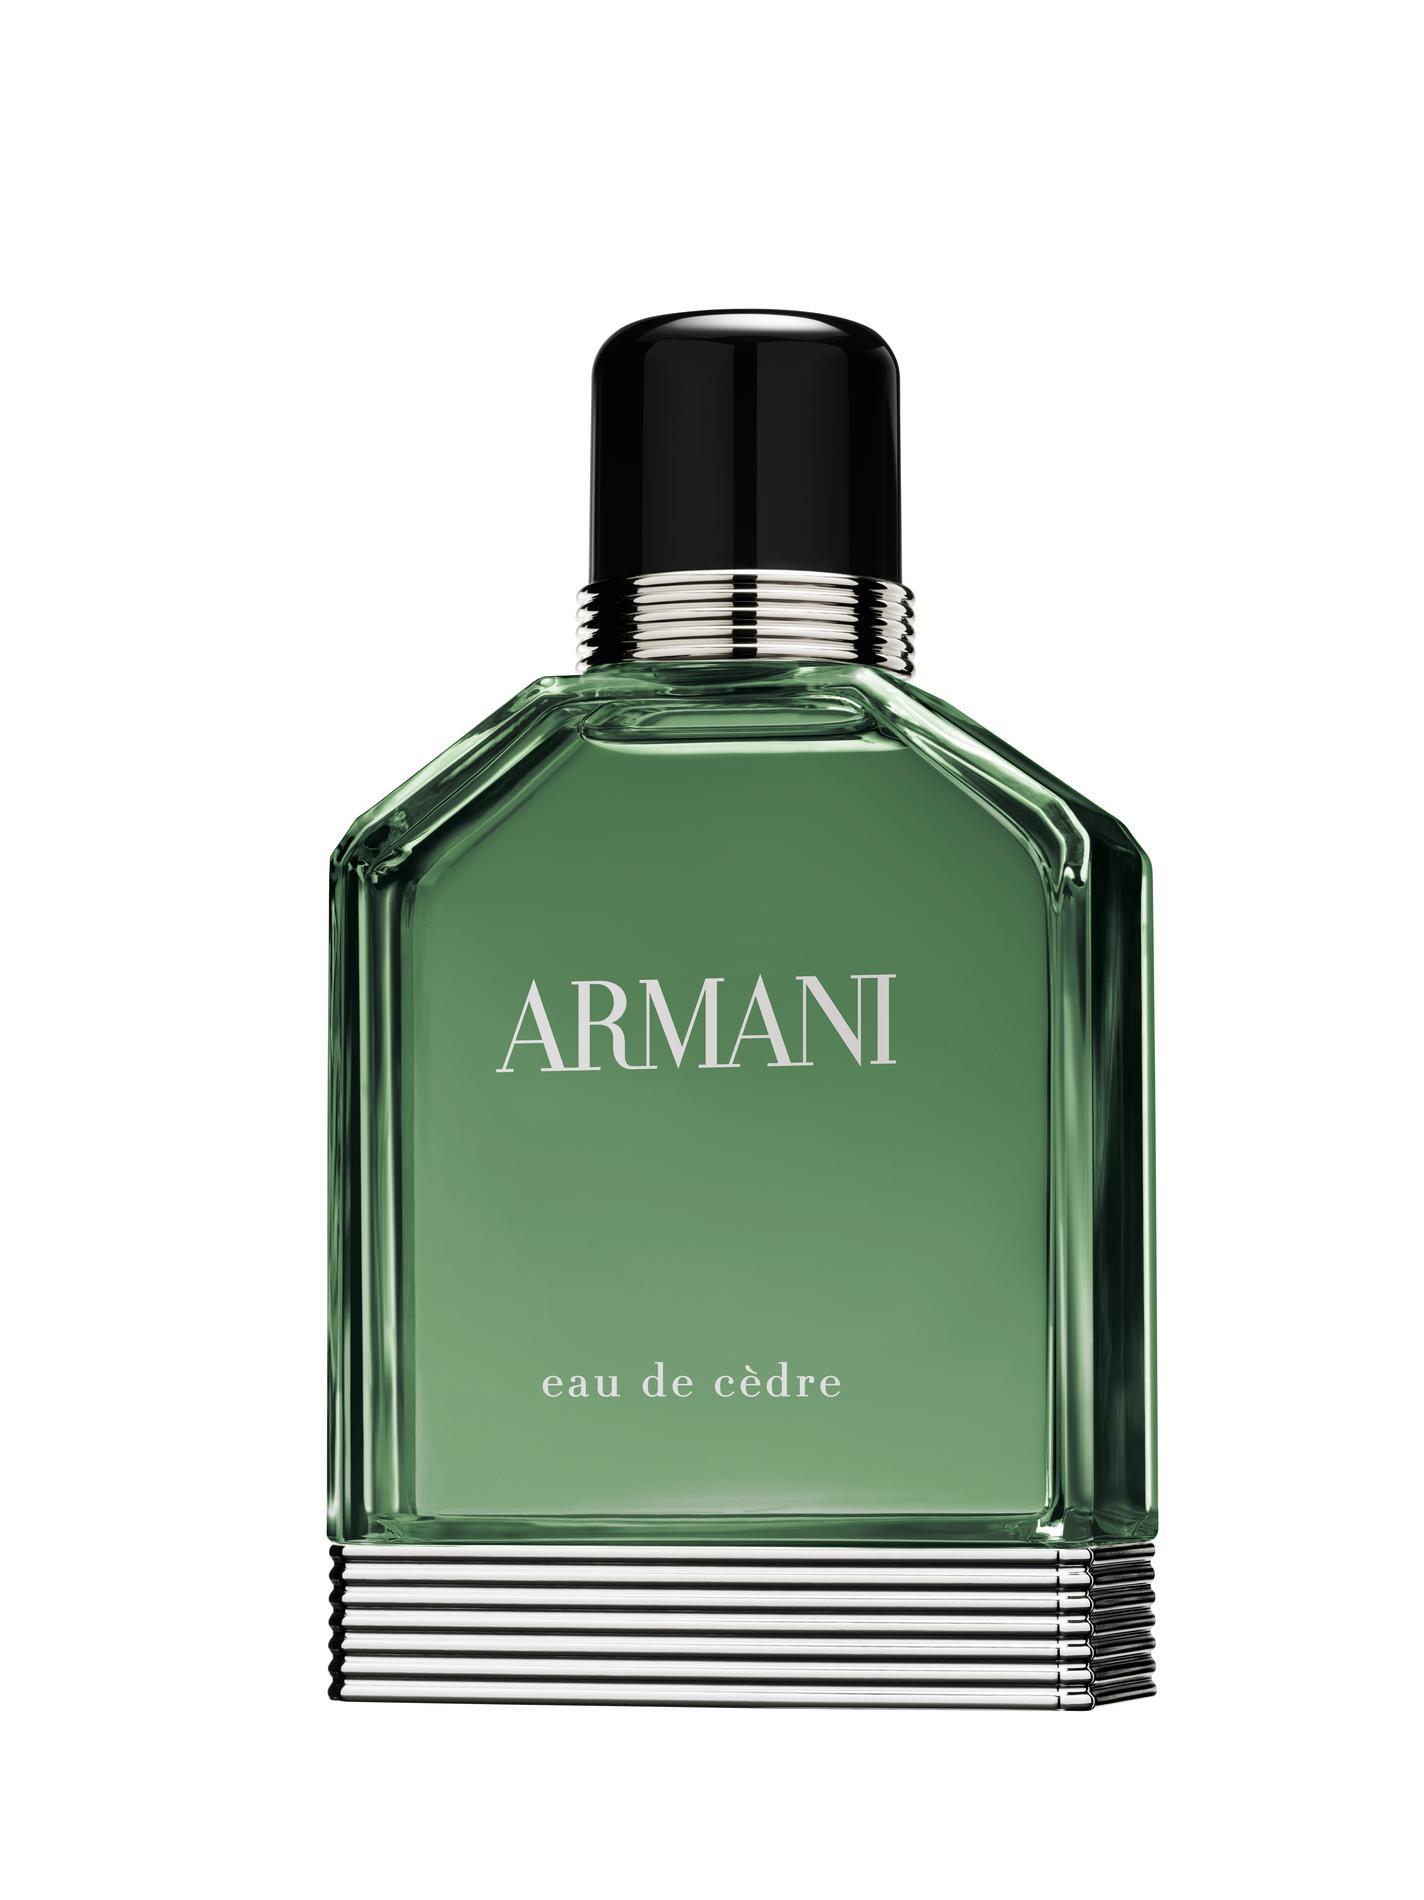 Madame MasculinsLa Des Guerre Figaro Sexes Parfums WreCBodQx